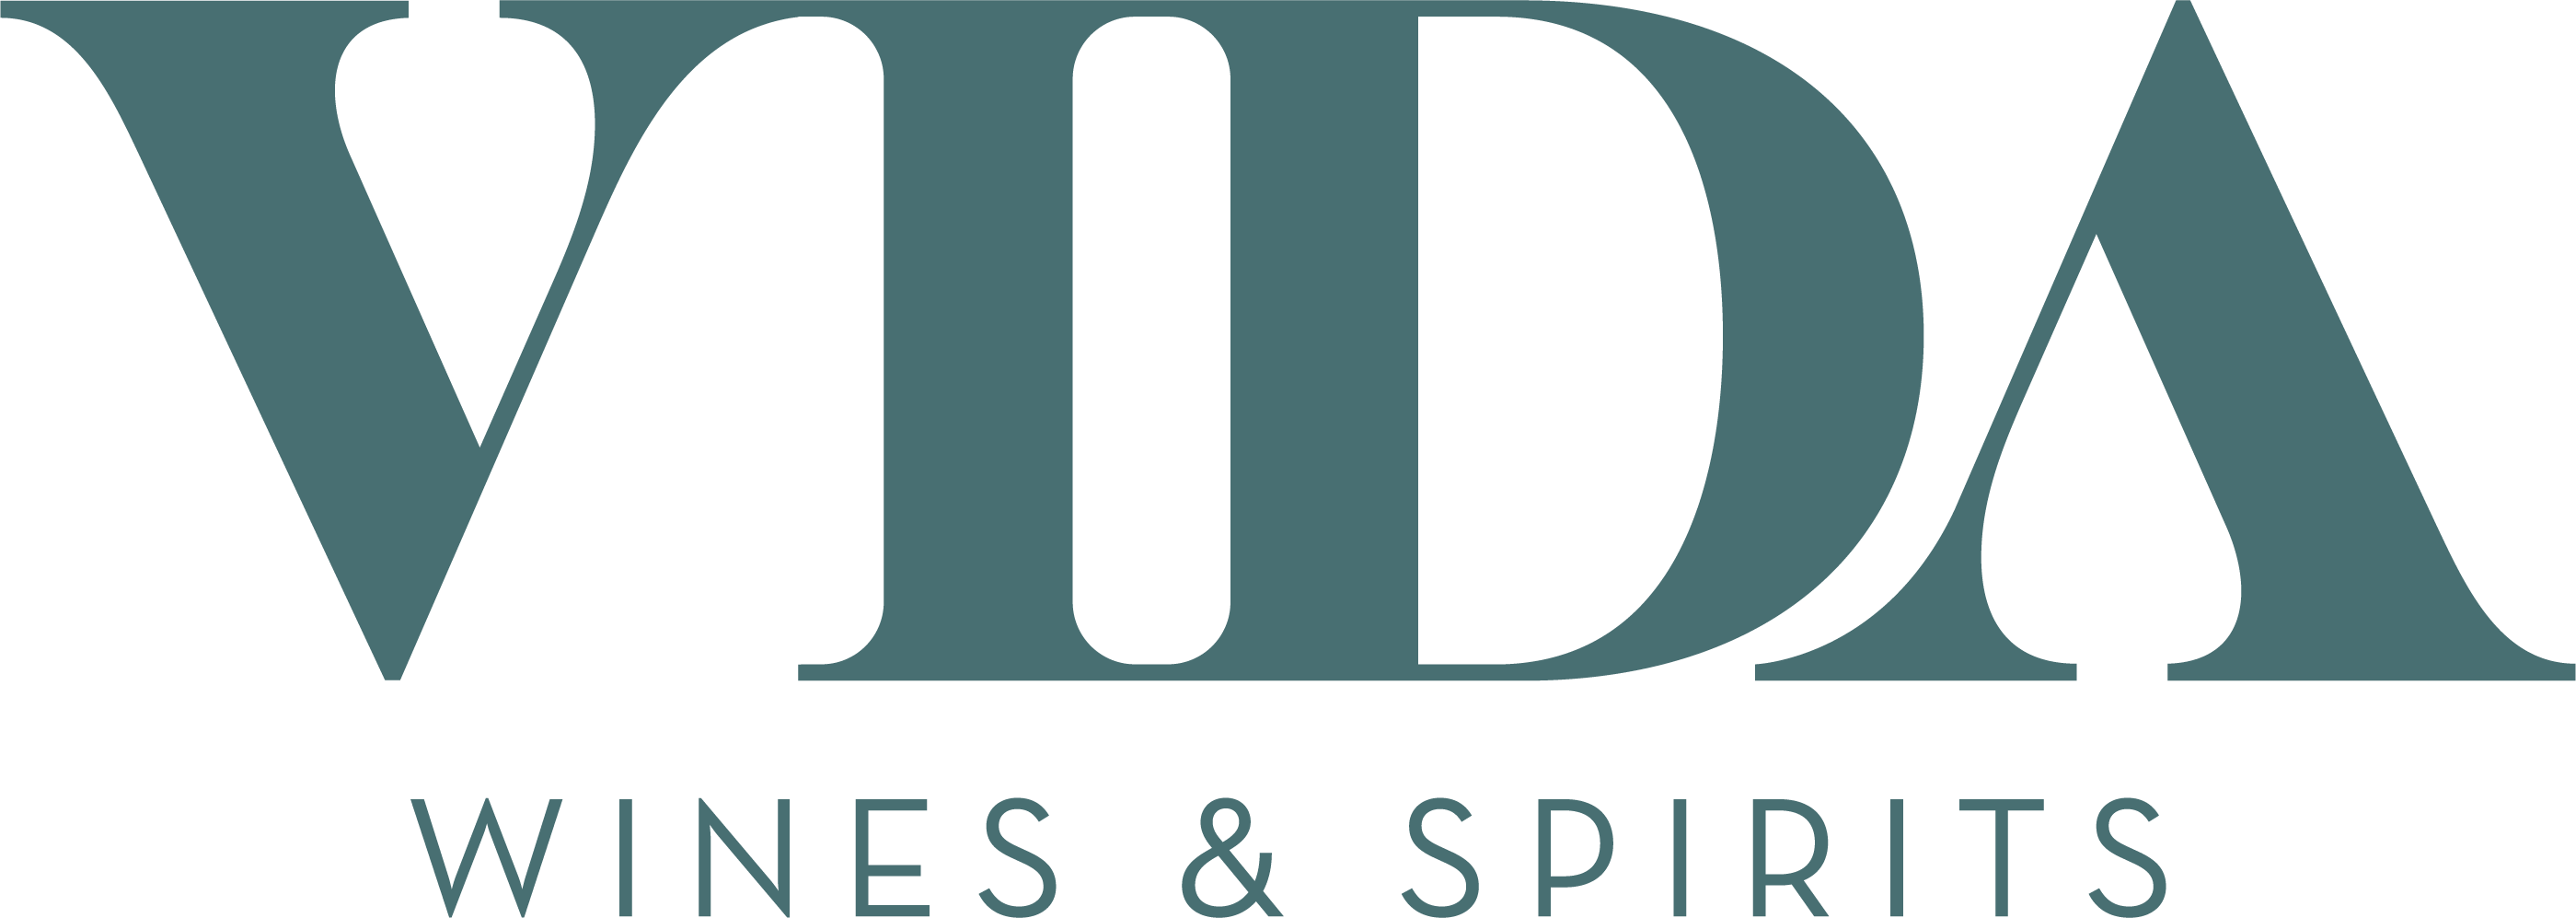 VIDA Wine & Spirits UK